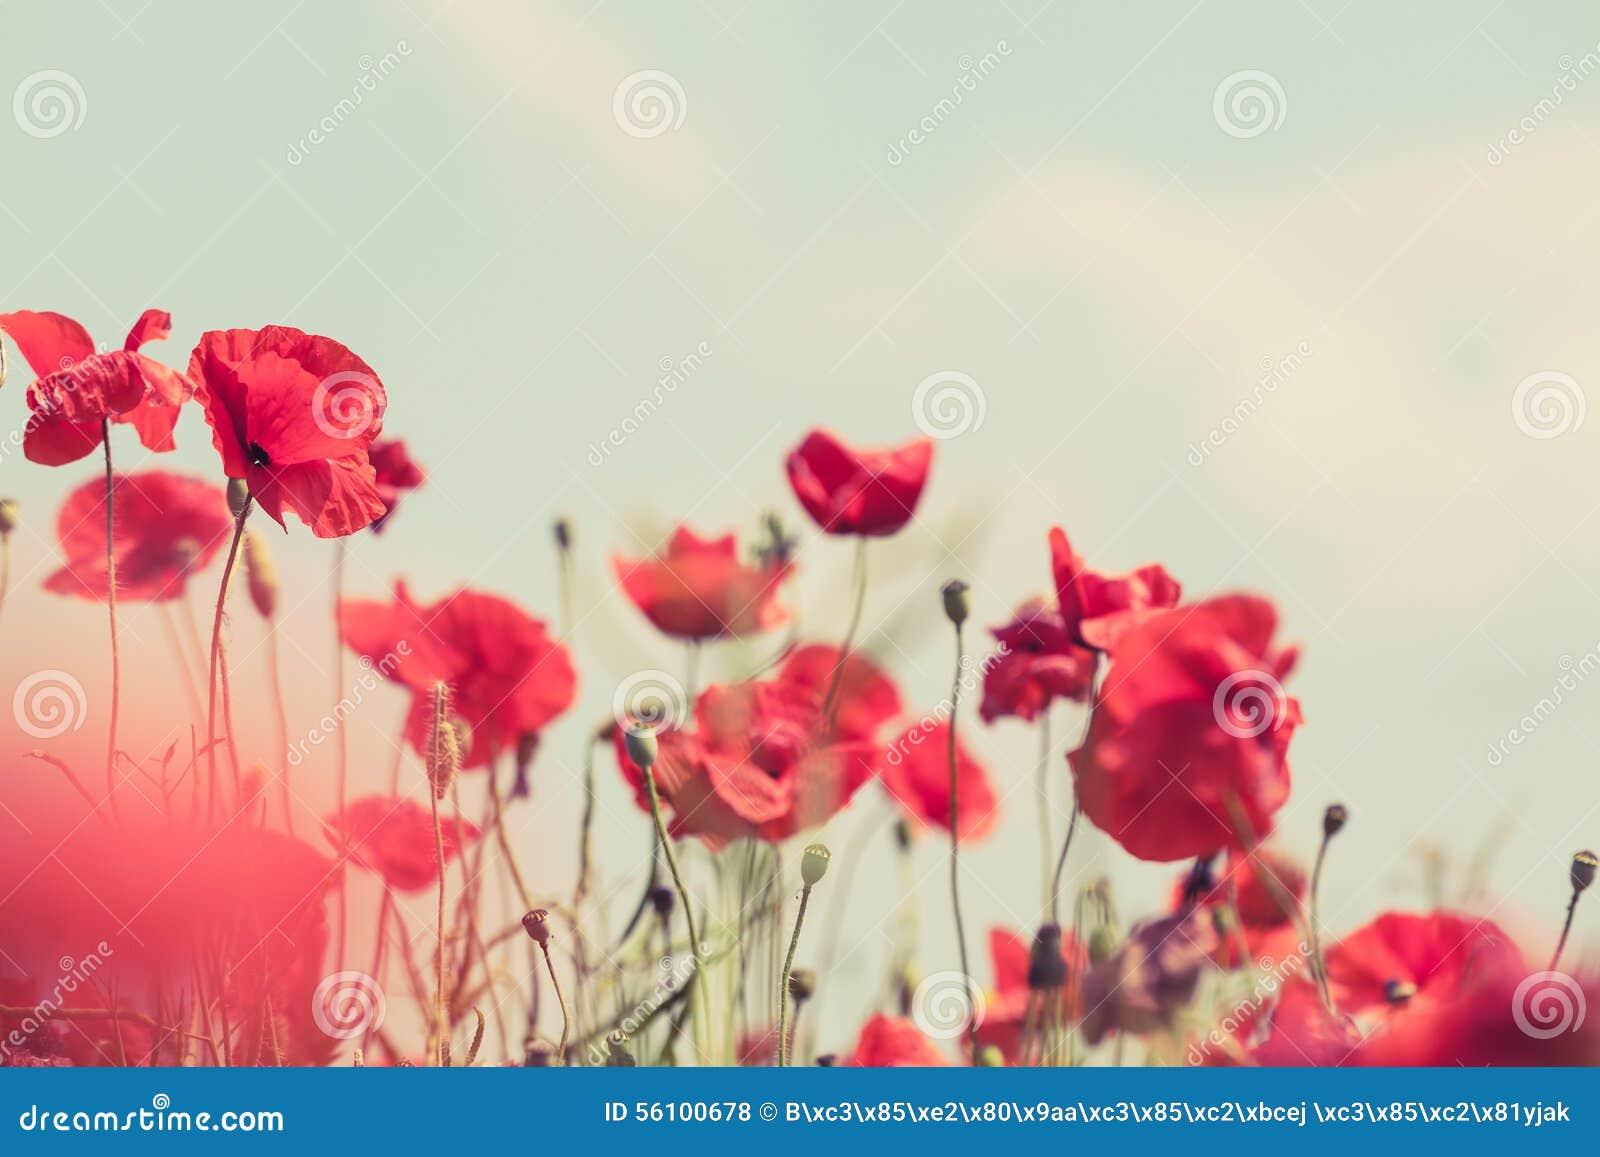 summer flower retro sunshine - photo #23